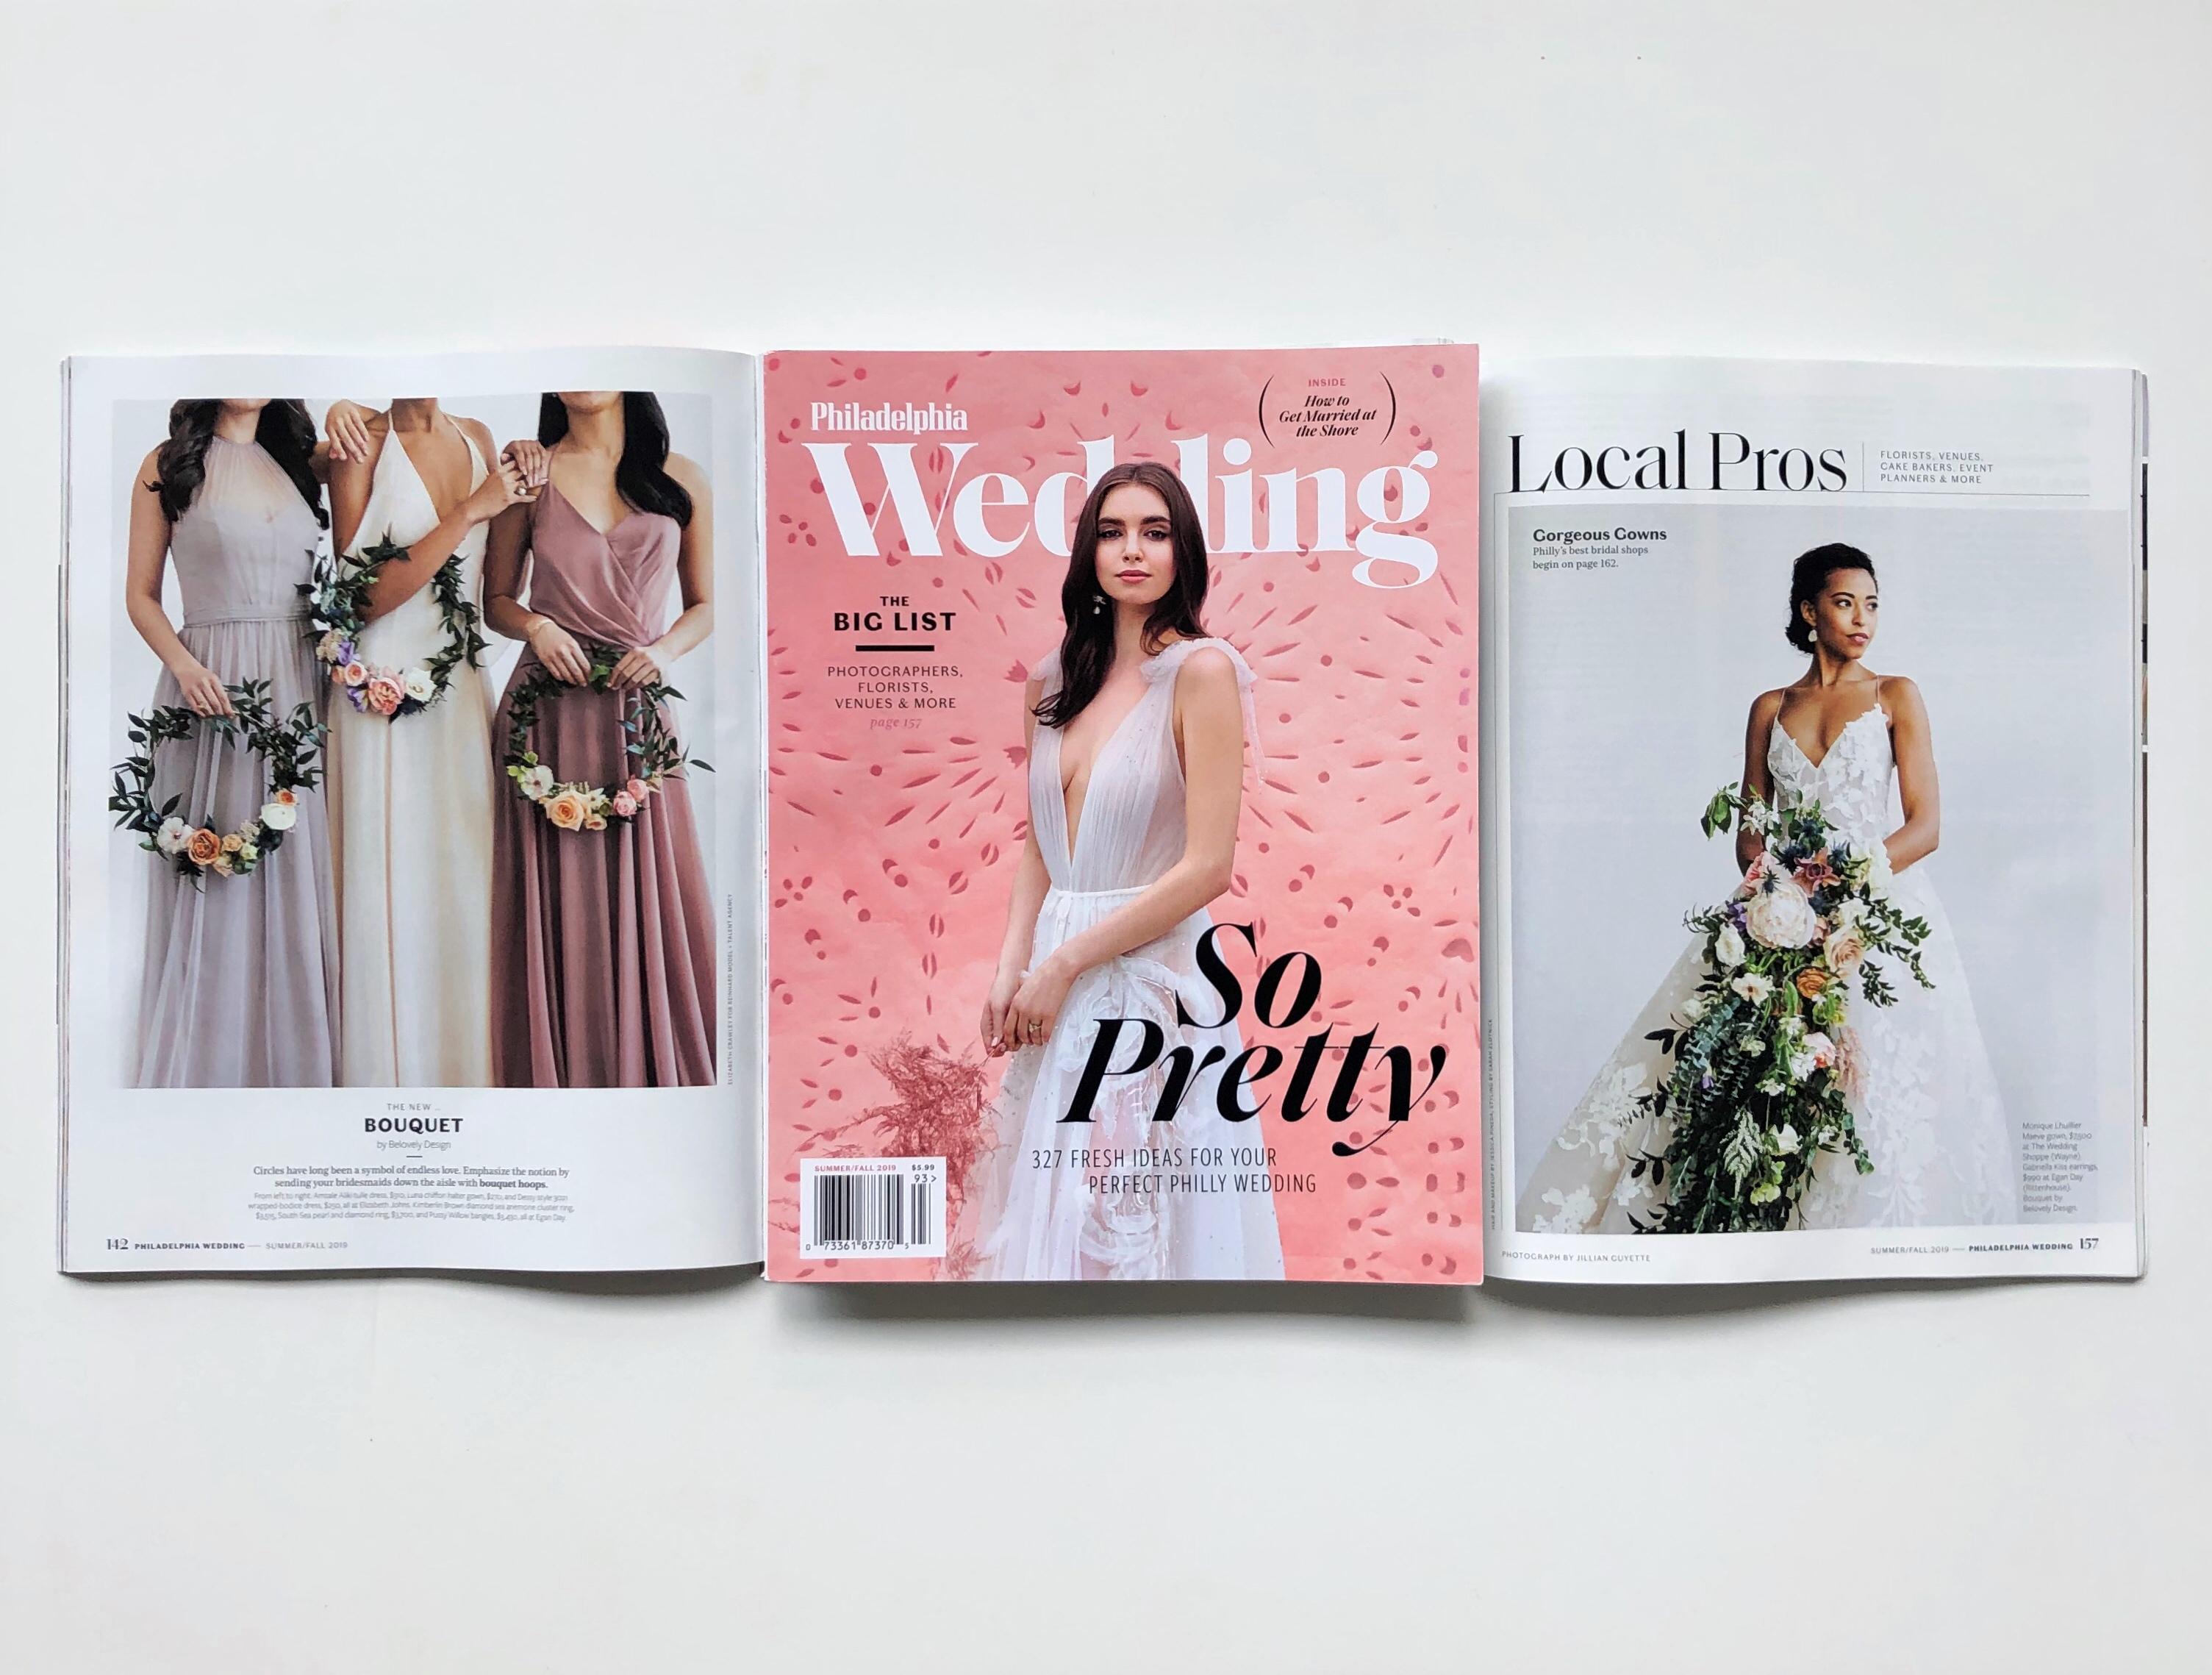 Philadelphia Wedding 2019